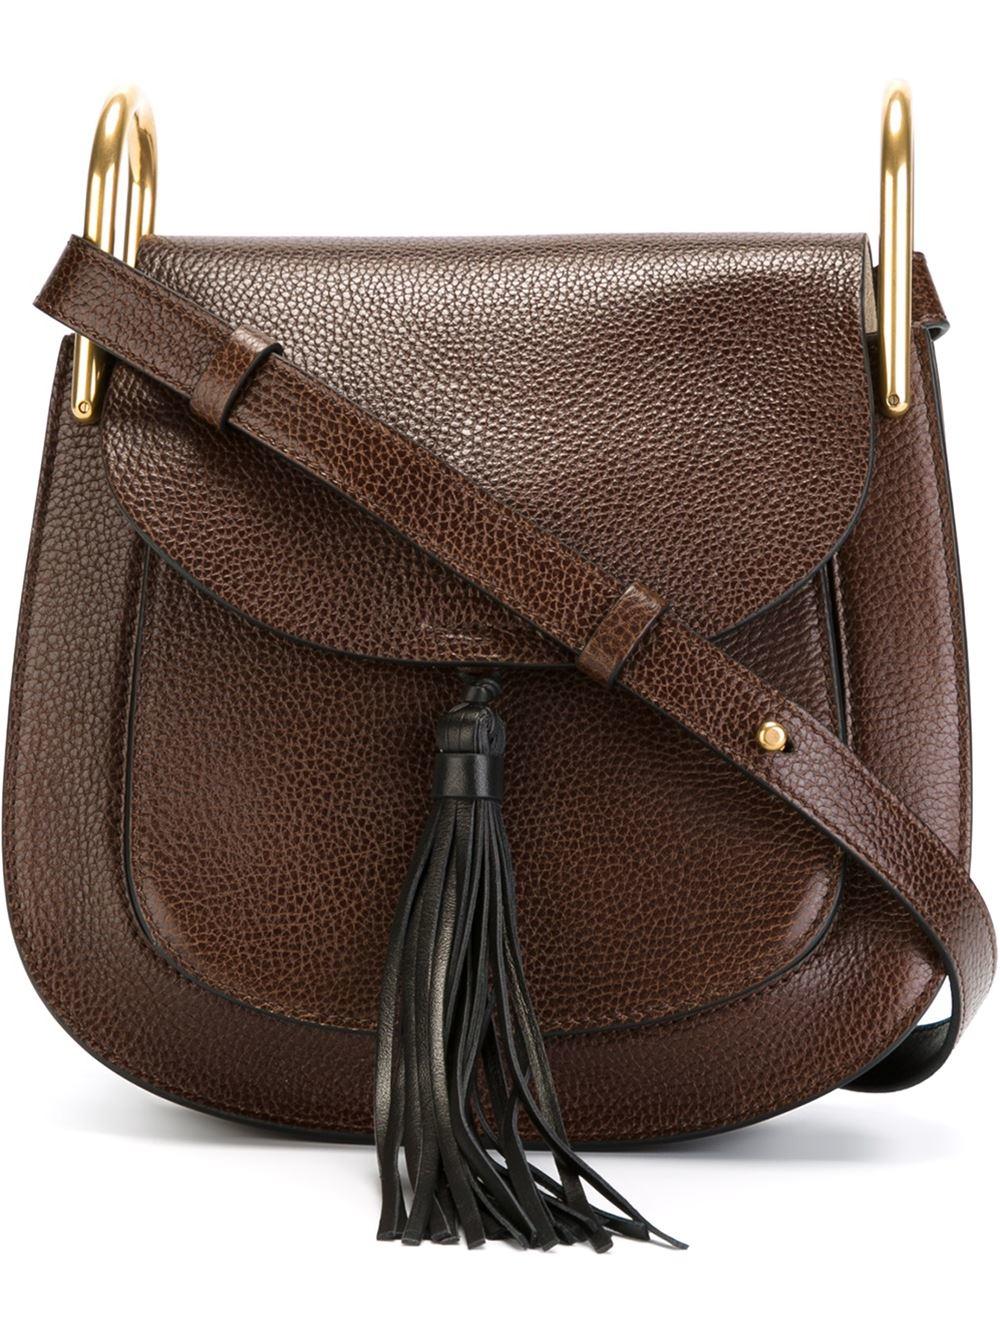 Chlo¨¦ \u0026#39;hudson\u0026#39; Shoulder Bag in Brown | Lyst